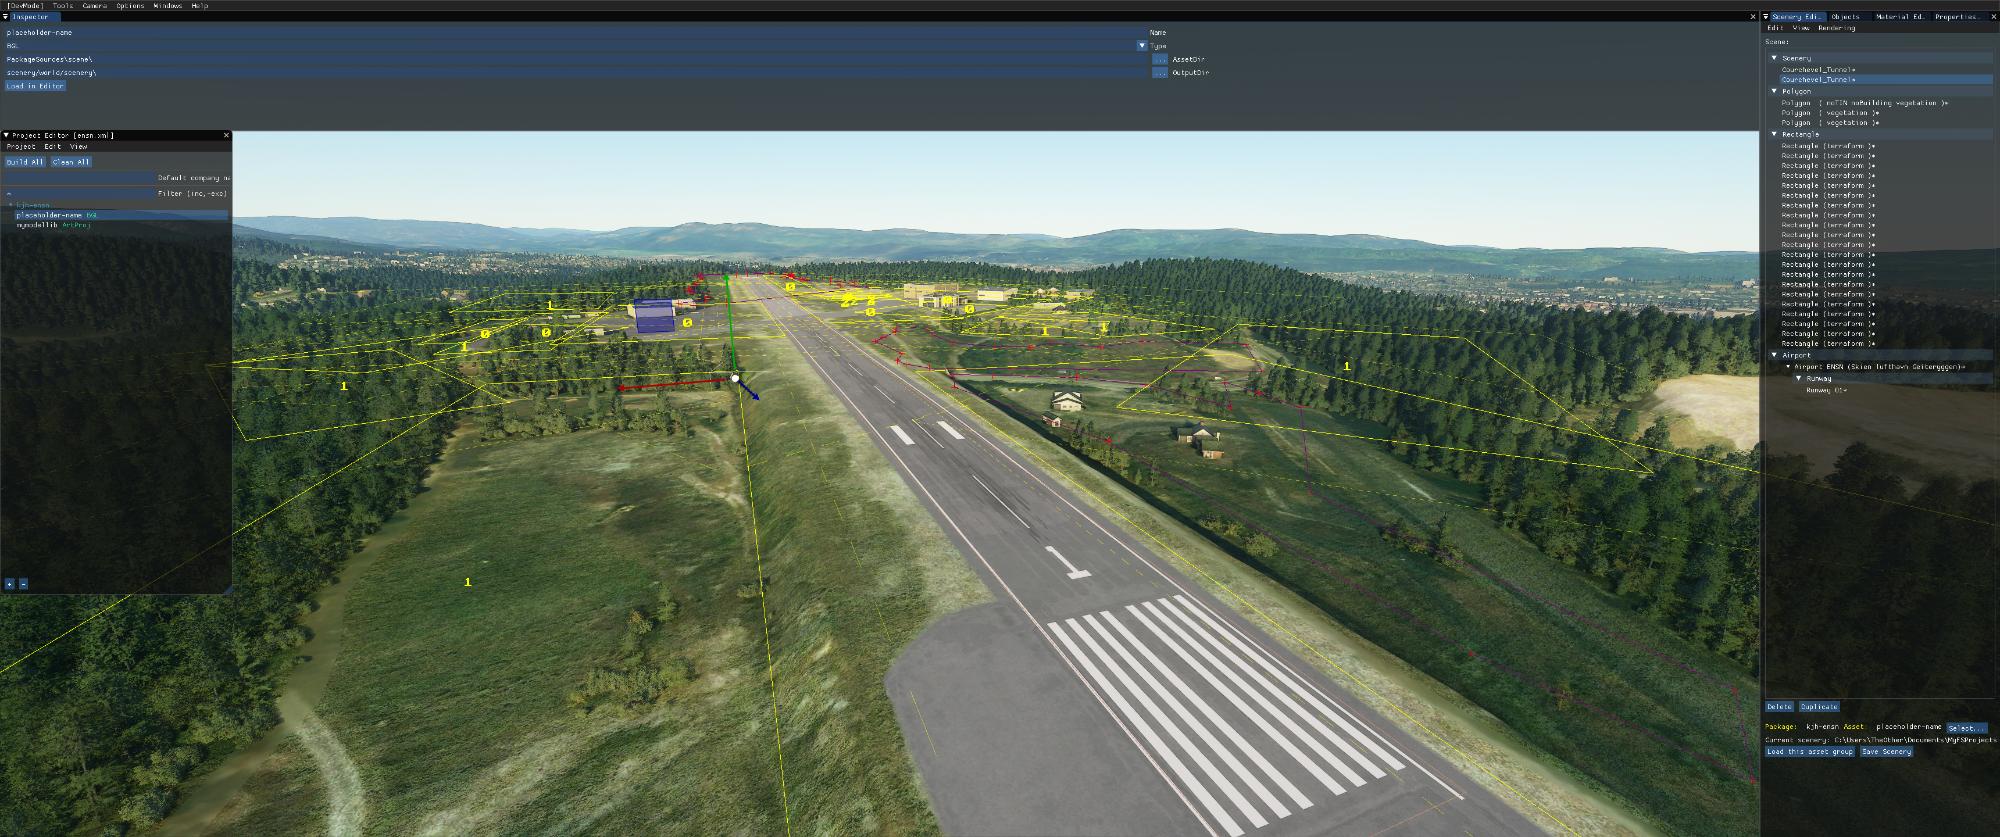 Microsoft Flight Simulator Screenshot 2020.10.26 - 22.29.36.19.png